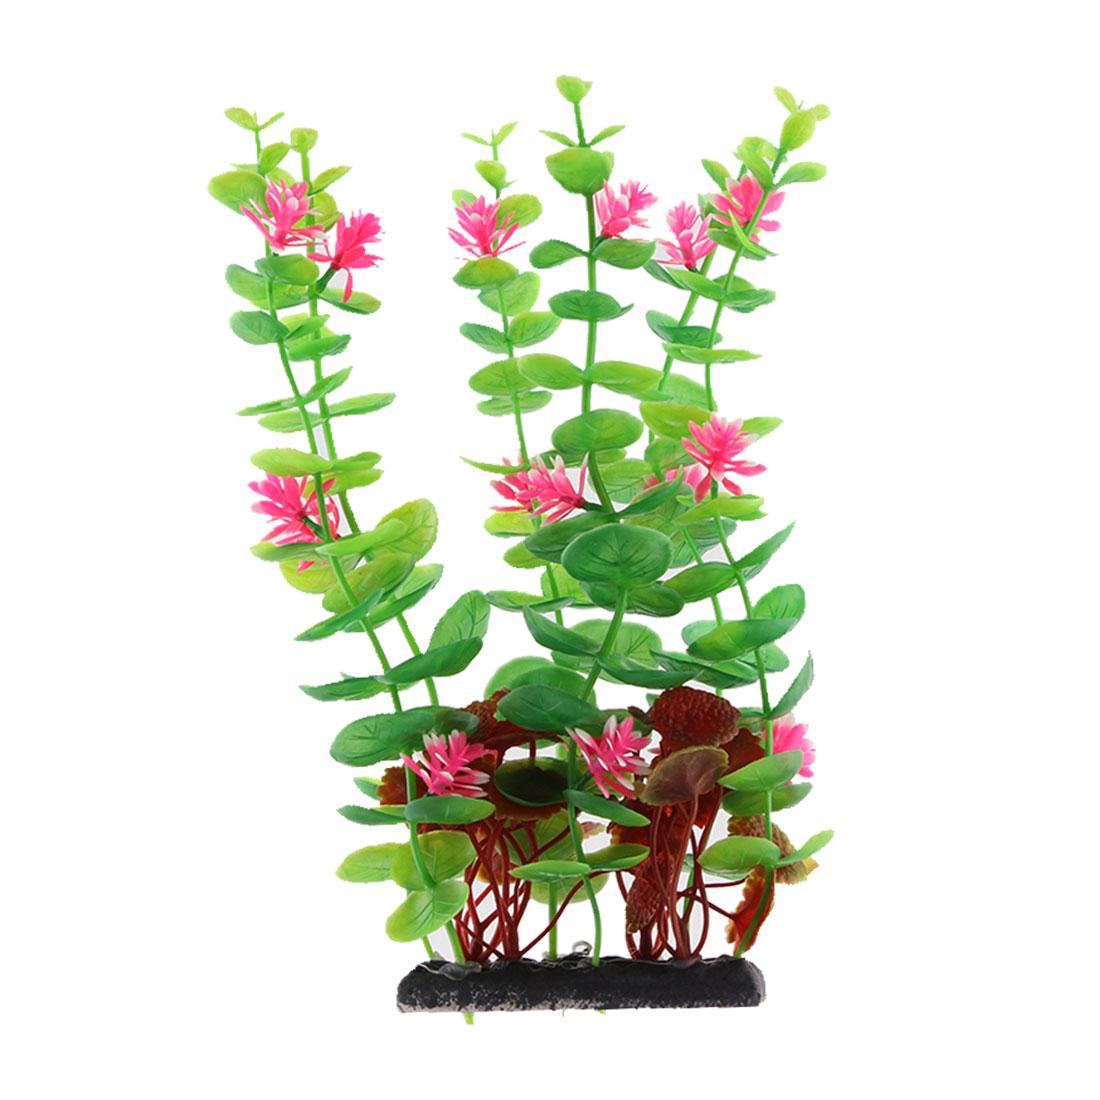 Aquarium Ceramic Base Plastic Artificial Flower Grass Plant Decoration Tricolor